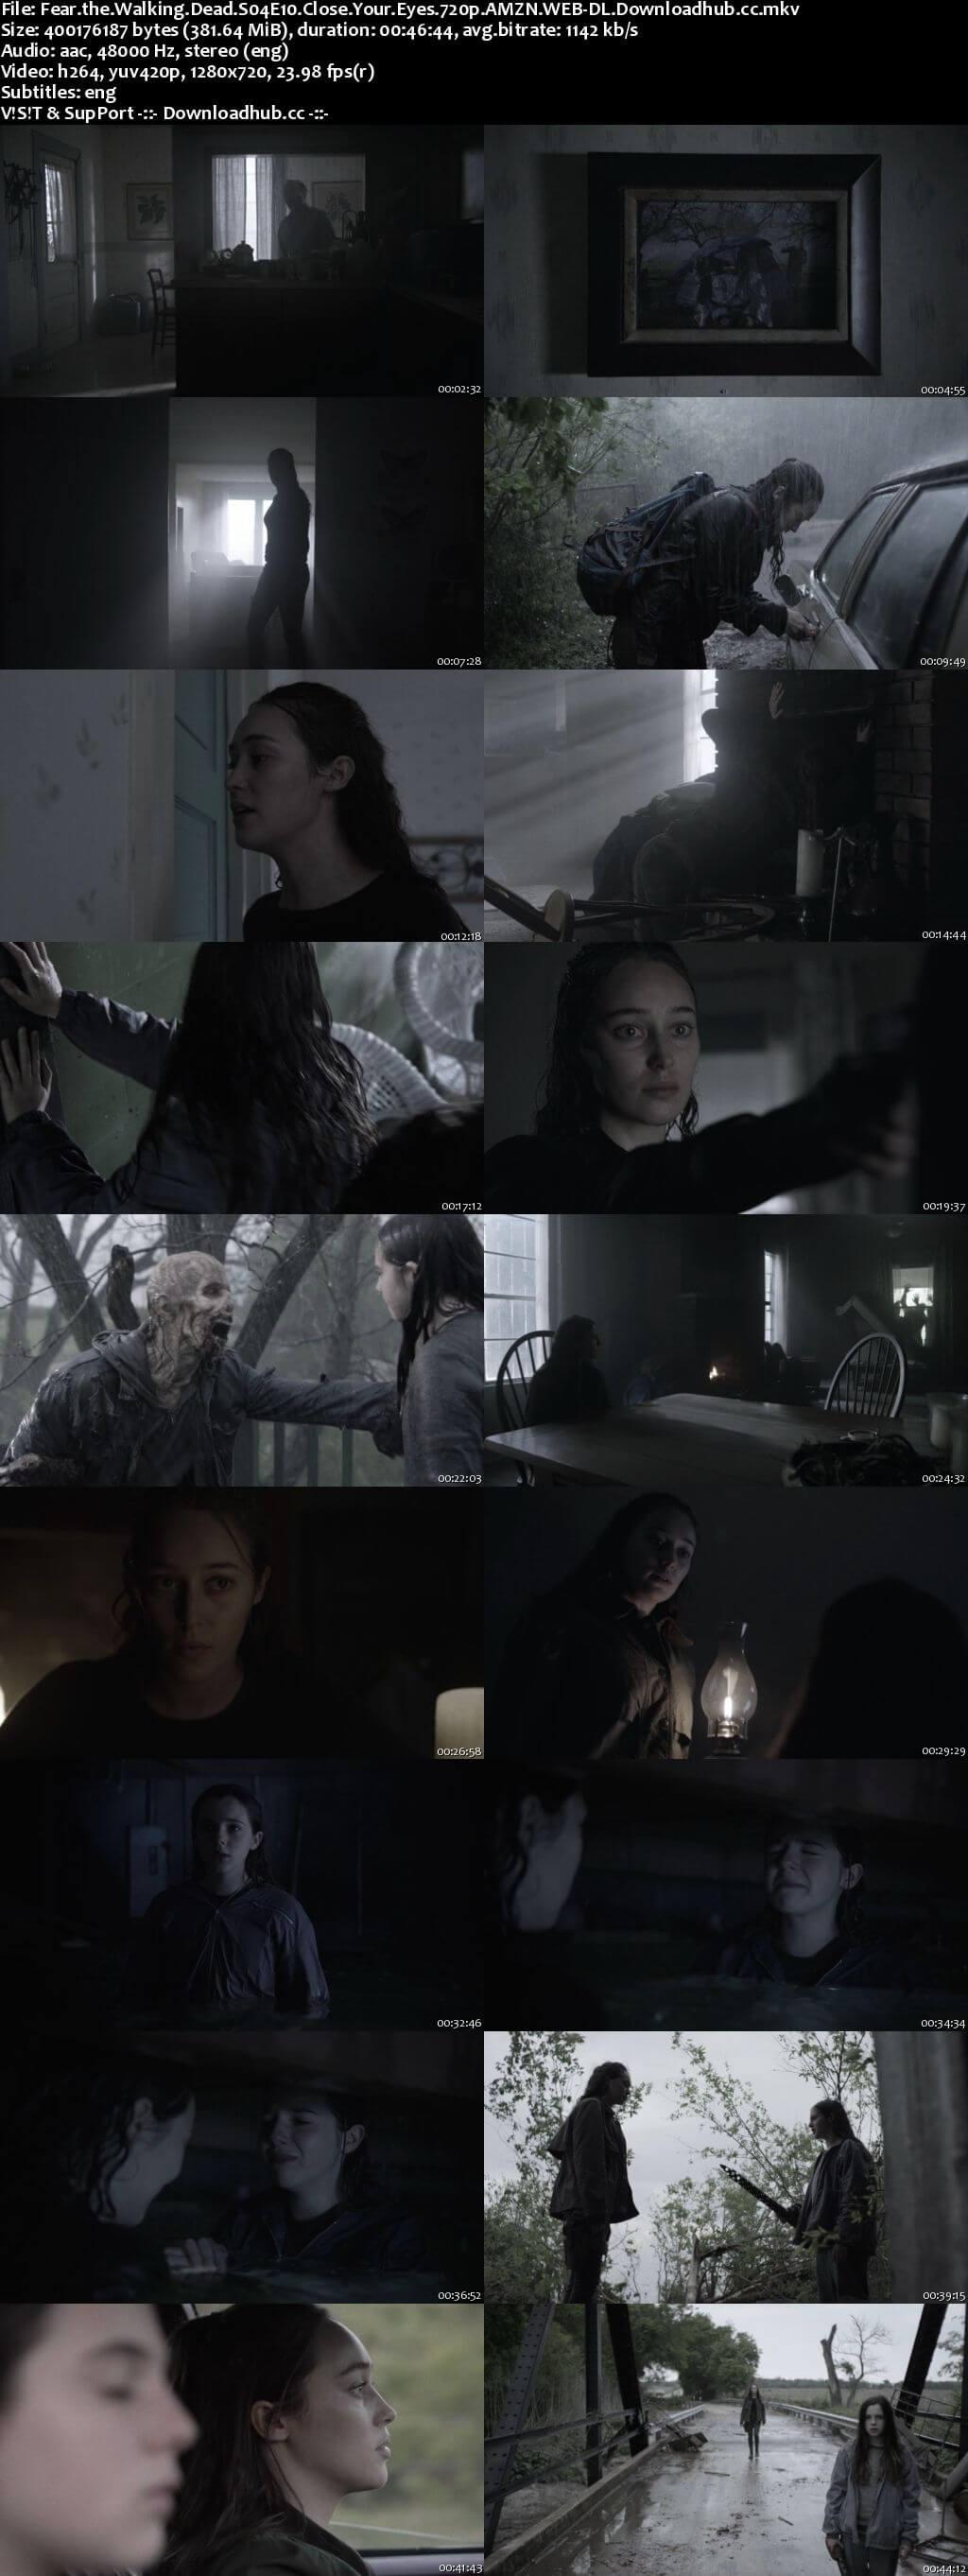 Fear the Walking Dead S04E10 380MB WEBRip 720p x264 ESubs